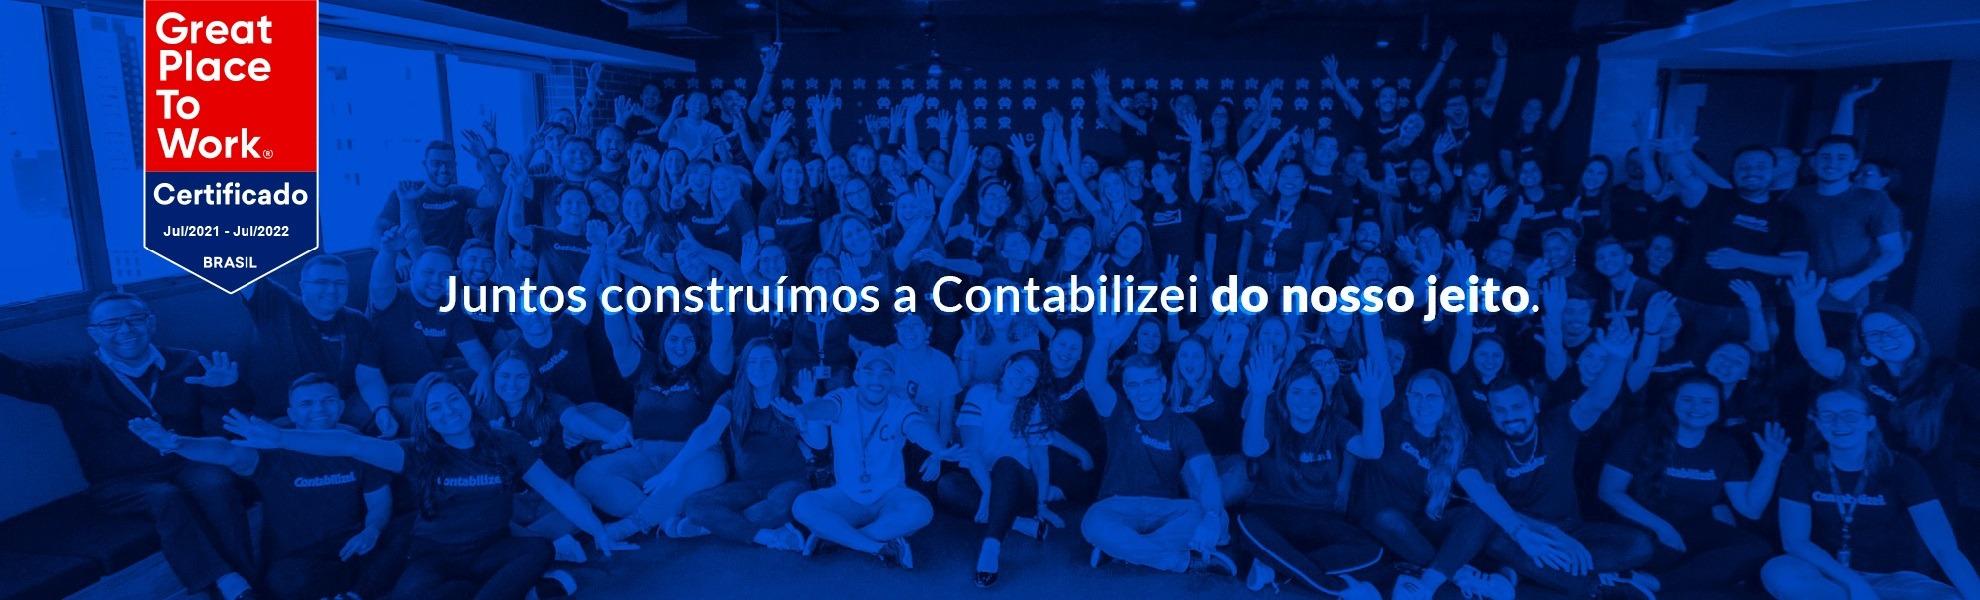 Consultor(a) de Vendas - Inside Sales